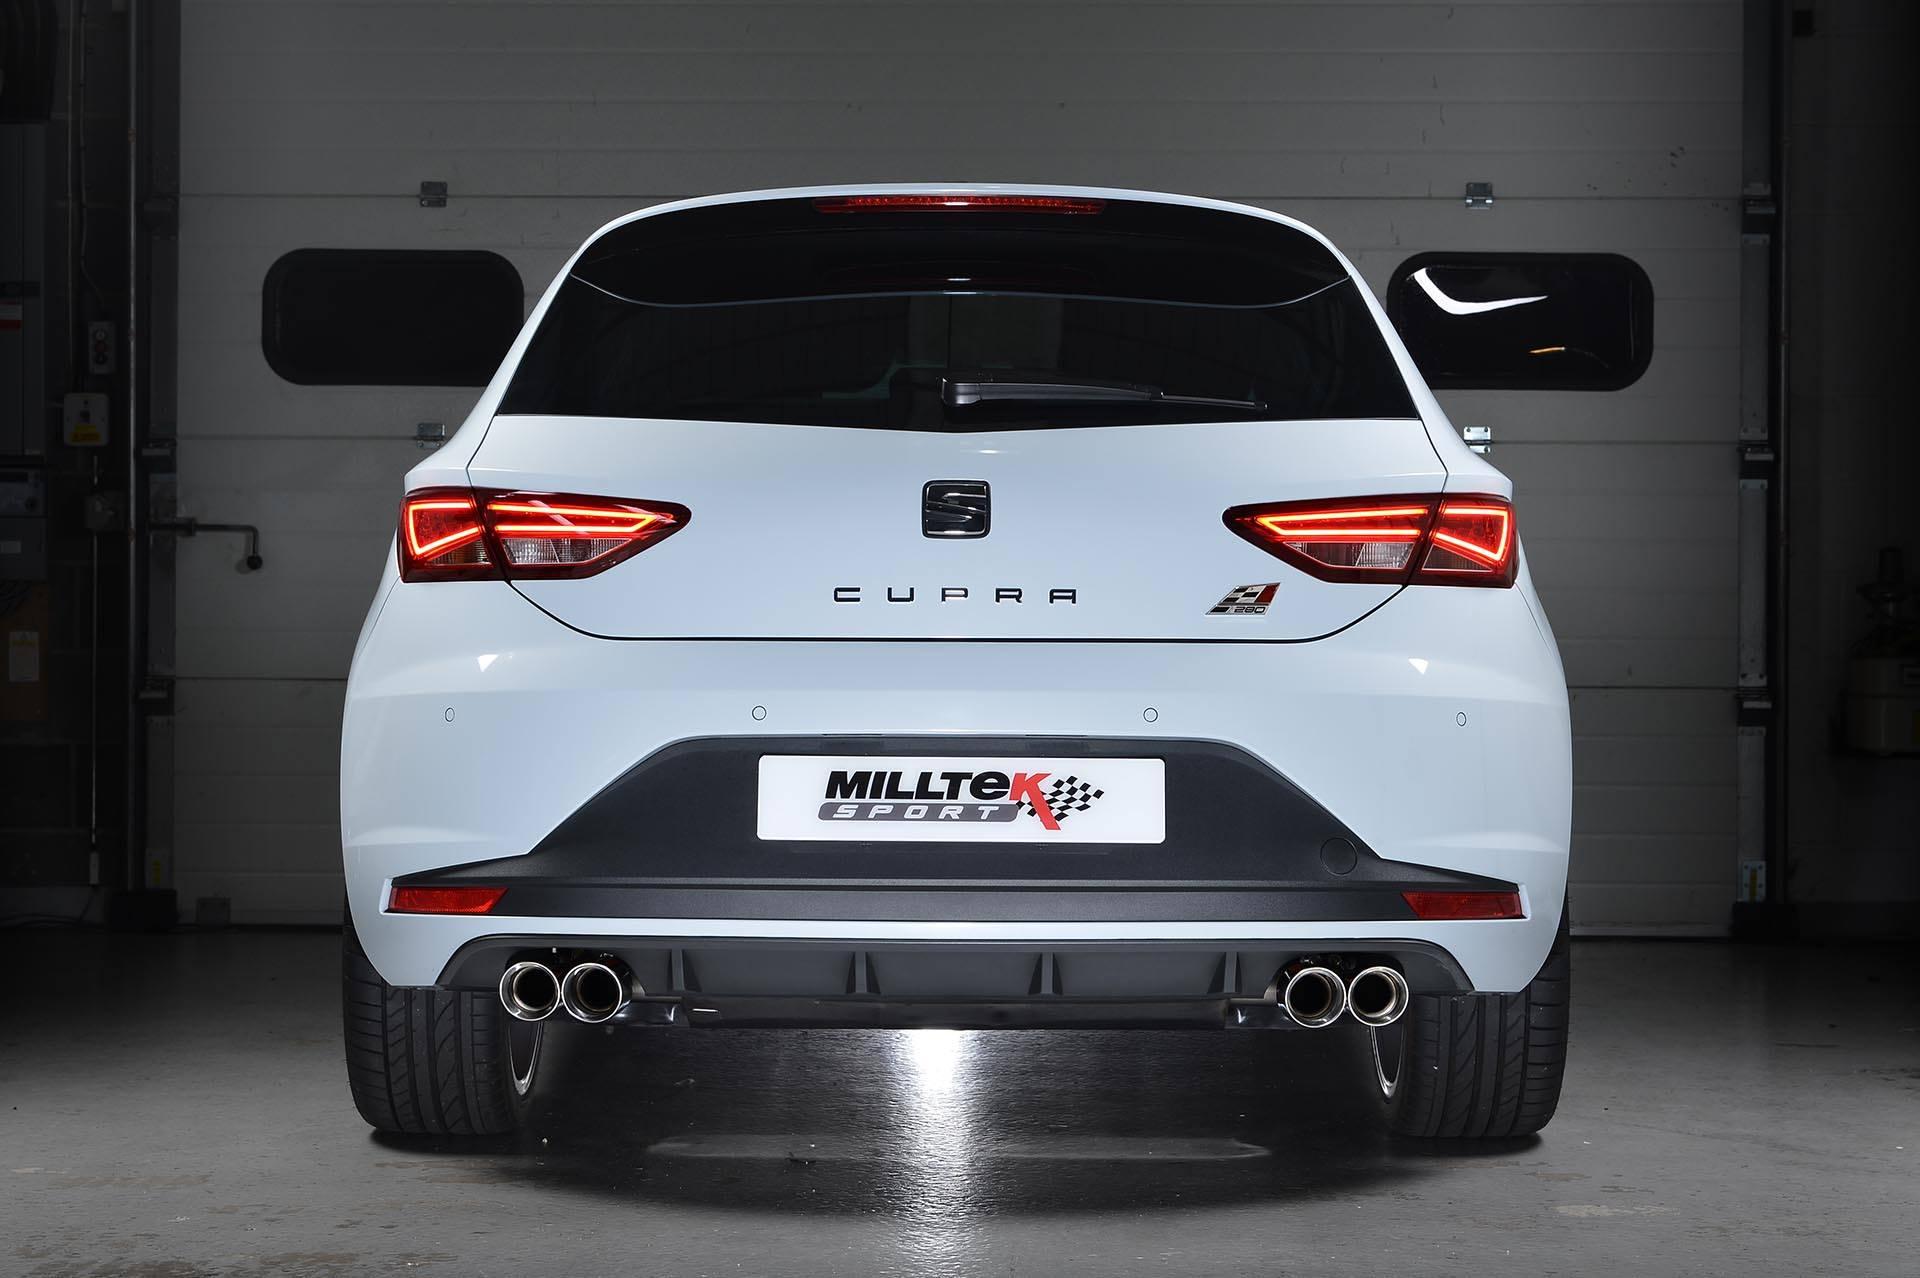 seat leon cupra 280 ps gets milltek performance exhaust autoevolution. Black Bedroom Furniture Sets. Home Design Ideas